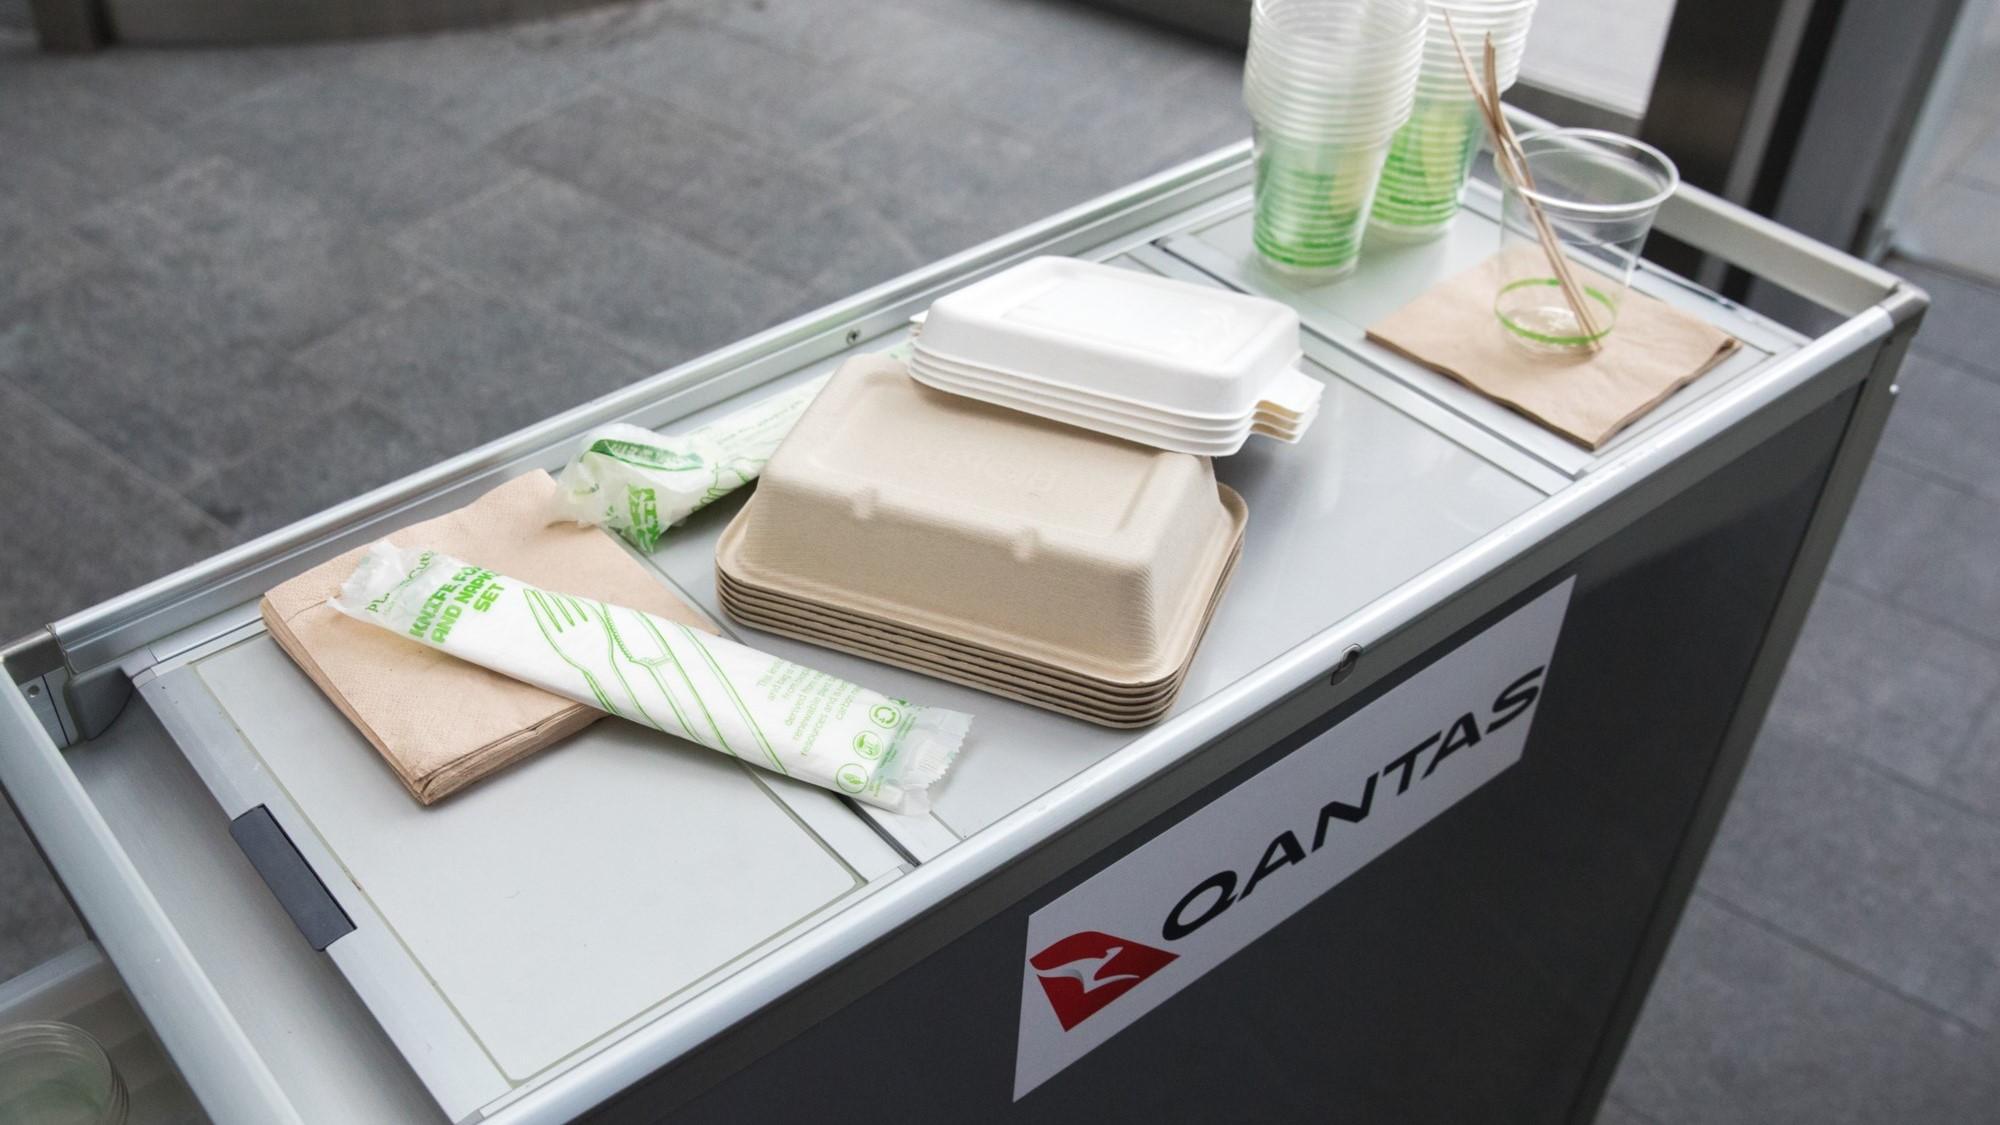 Qantas packaging